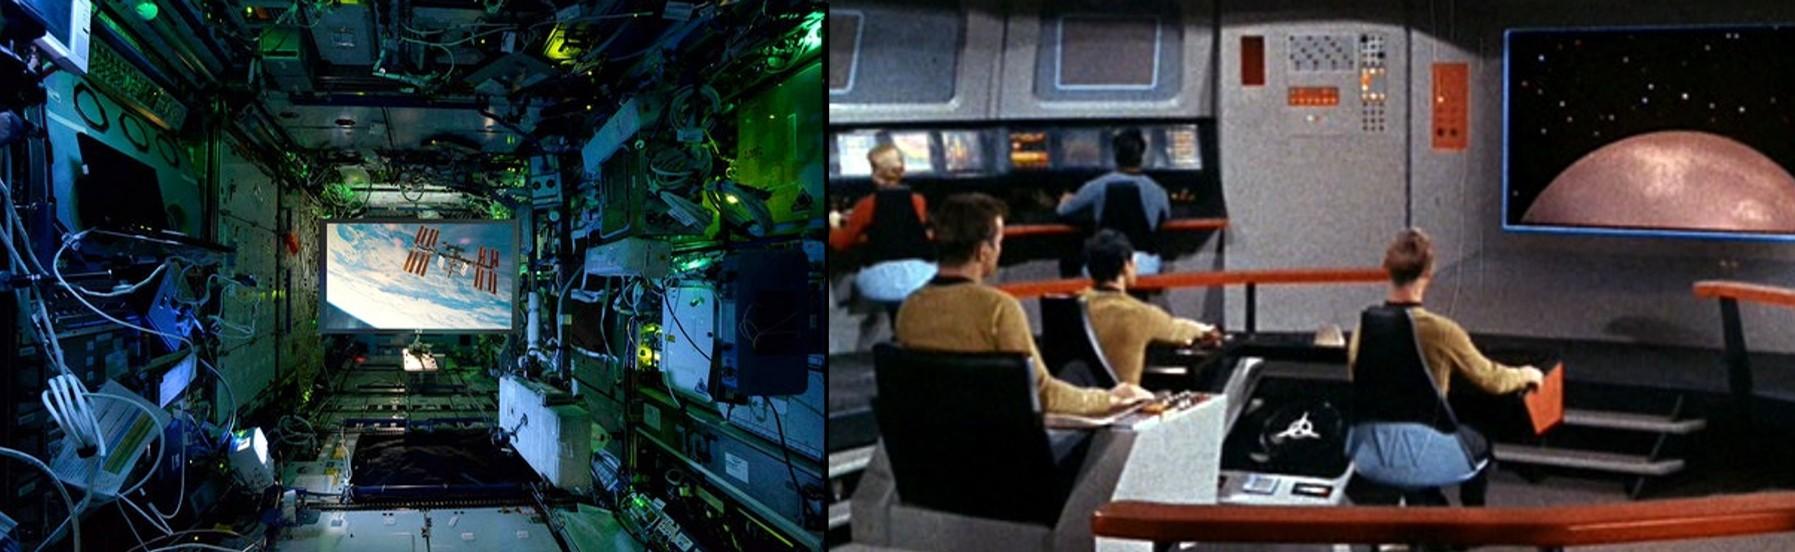 ISS vs ST Viewscreen